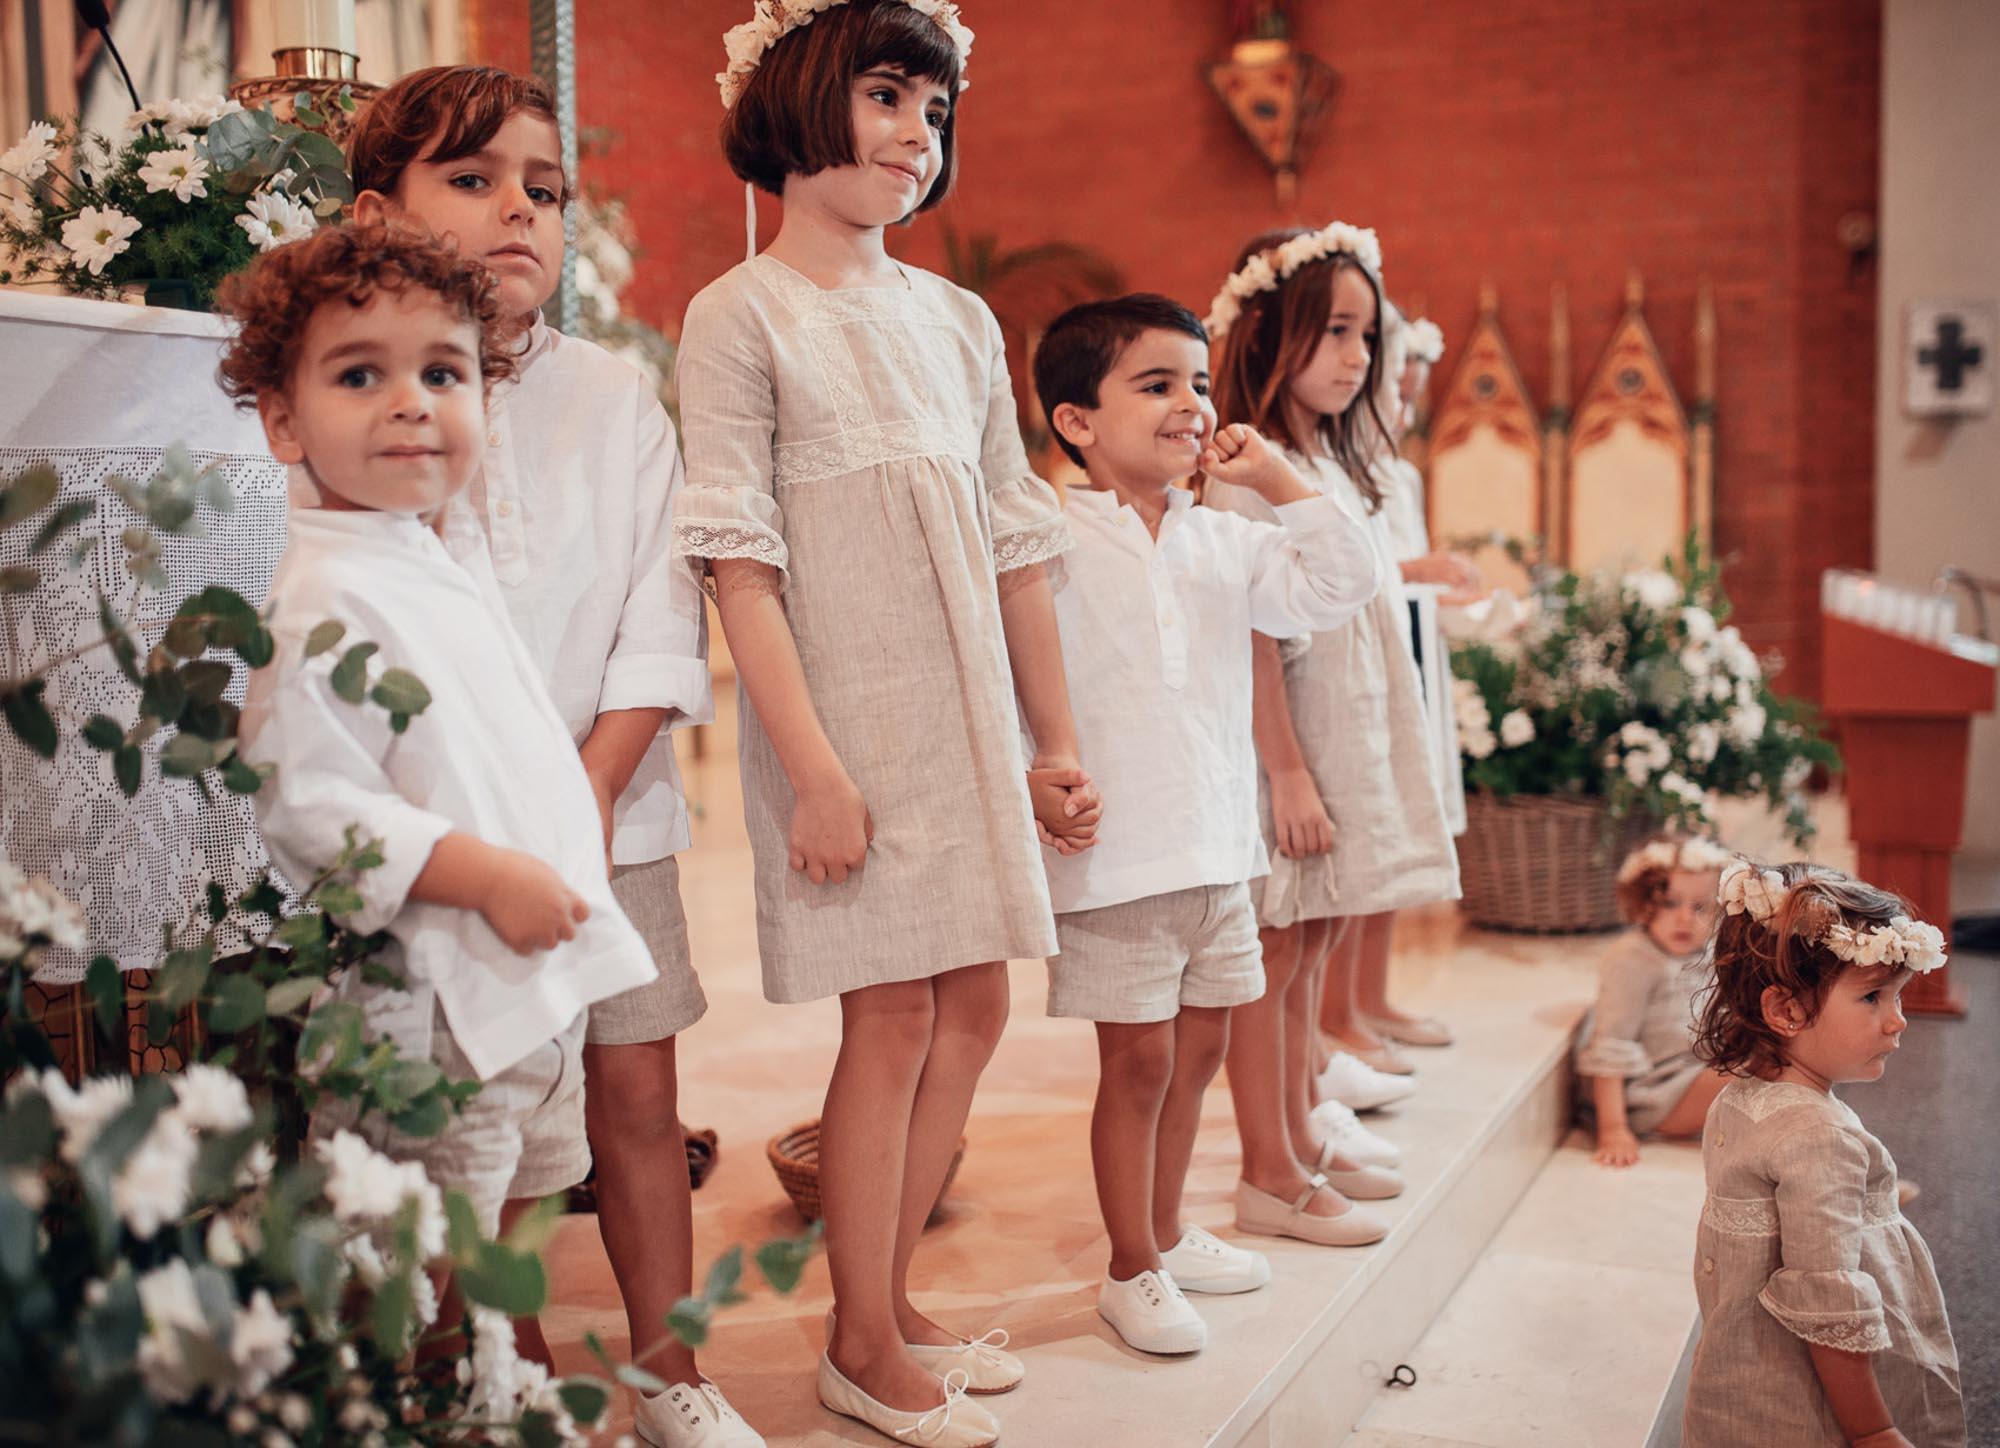 niños iglesia altar wedding blanco coronas flores cabo de palos